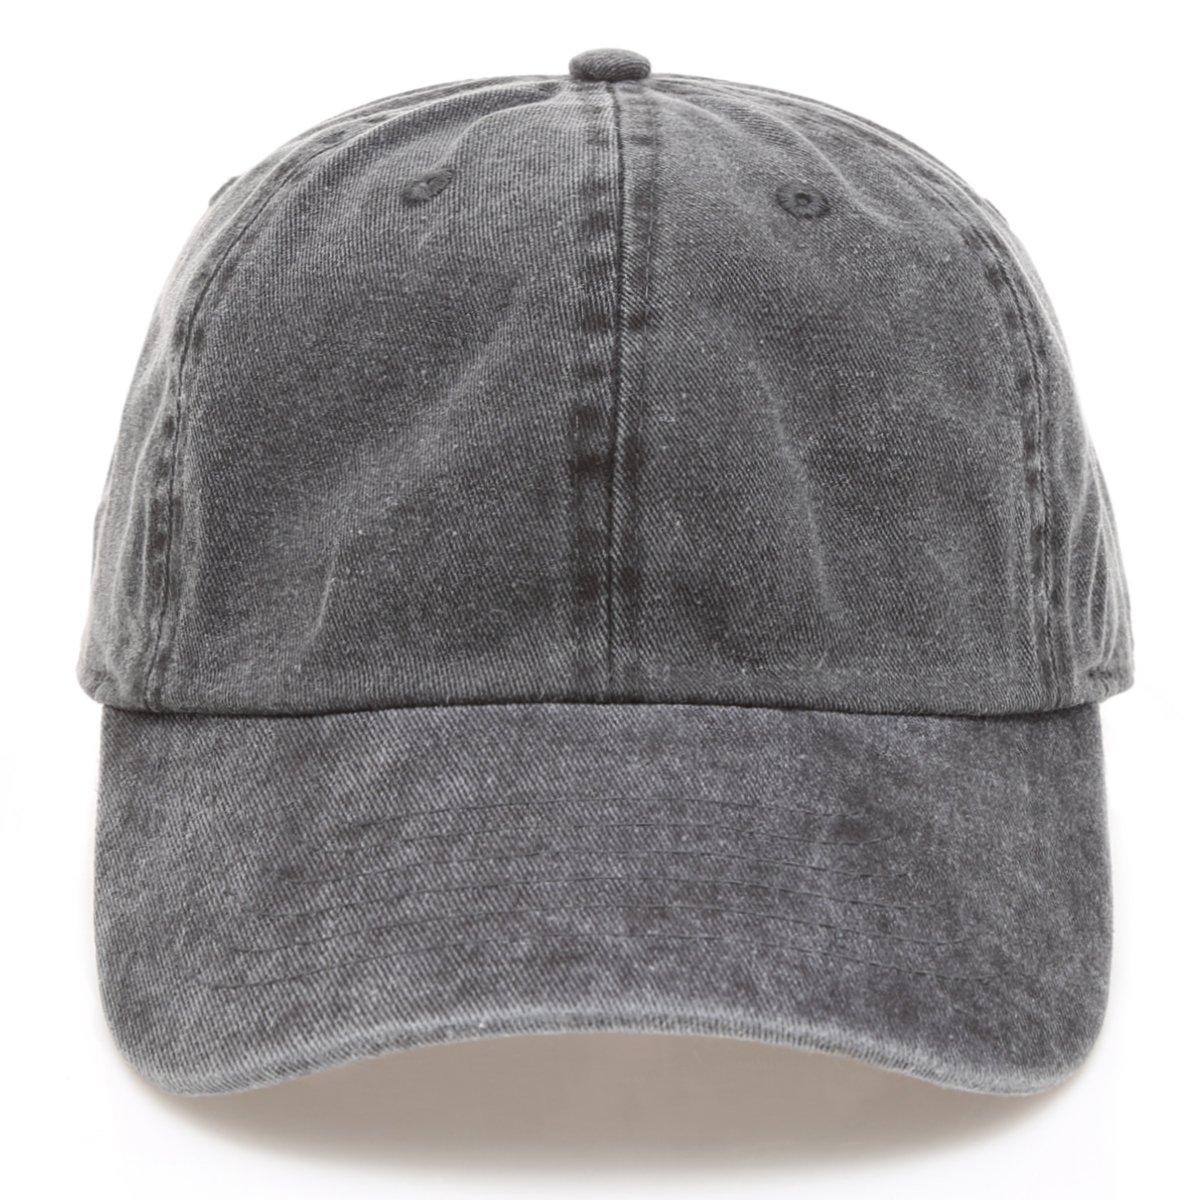 MIRMARU Low Profile Vintage Washed Pigment Dyed 100% Cotton Adjustable Baseball Cap Hat.(Black)